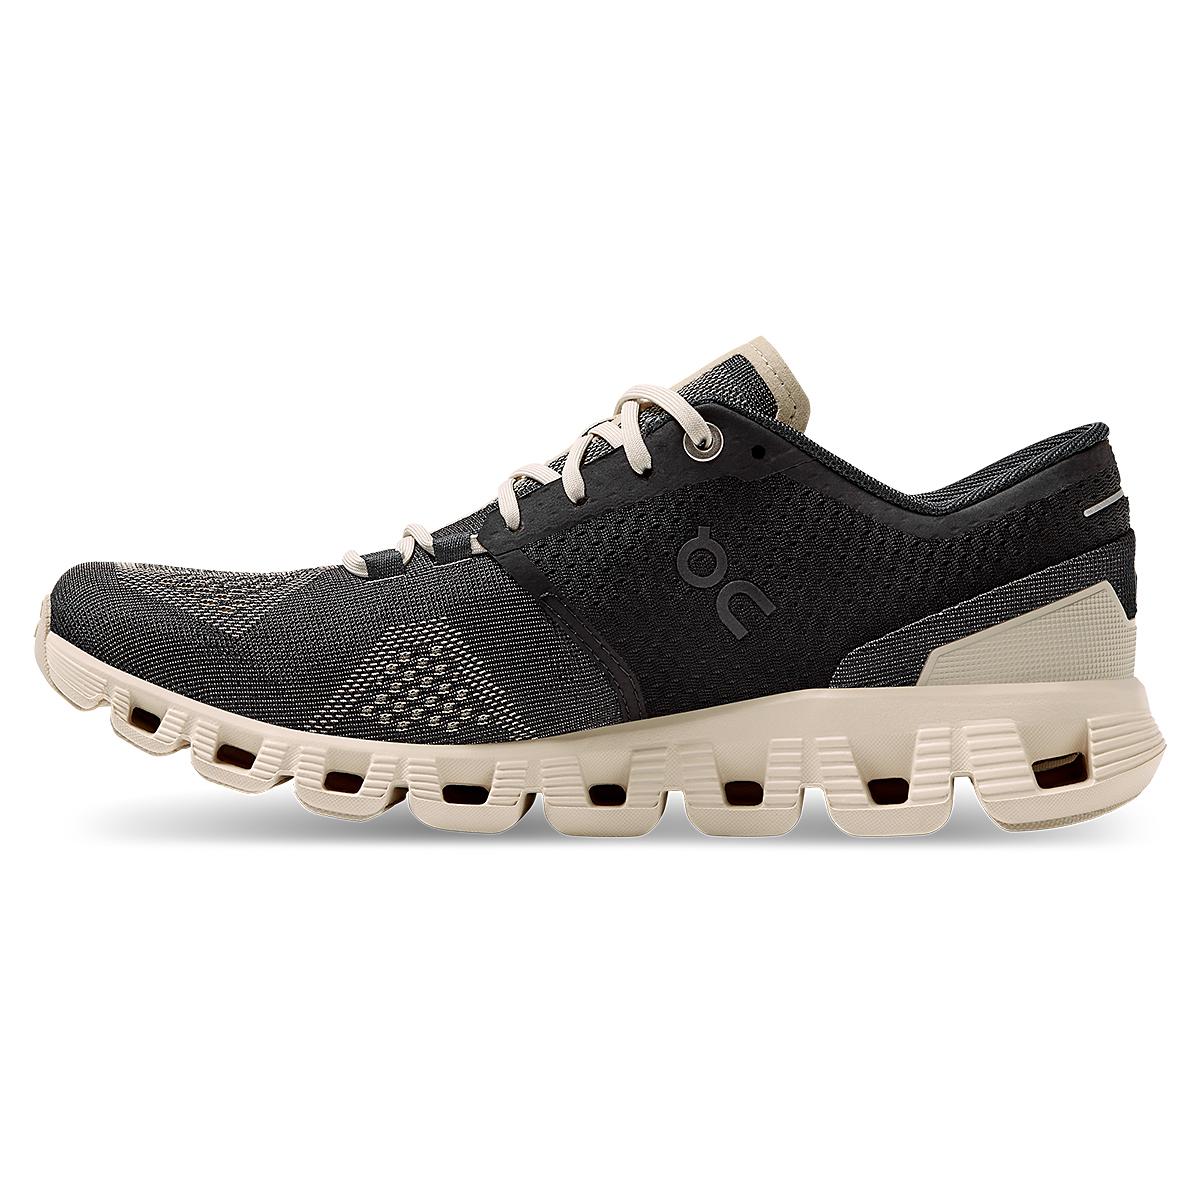 Women's On Cloud X 2.0 Running Shoe - Color: Black/Pearl - Size: 5 - Width: Regular, Black/Pearl, large, image 3